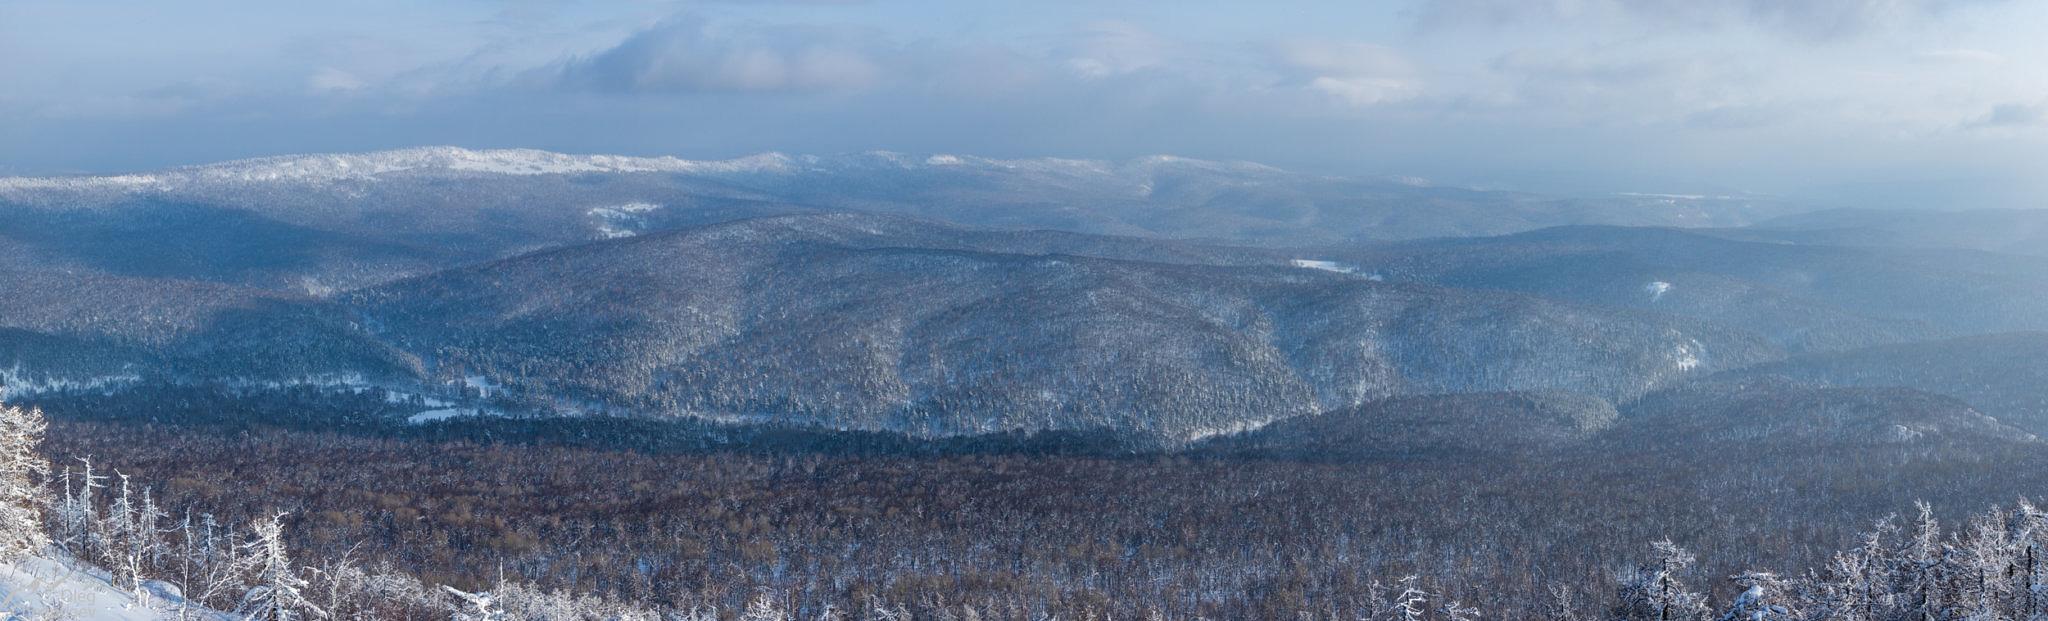 Долина реки Курыгас с горы Масим